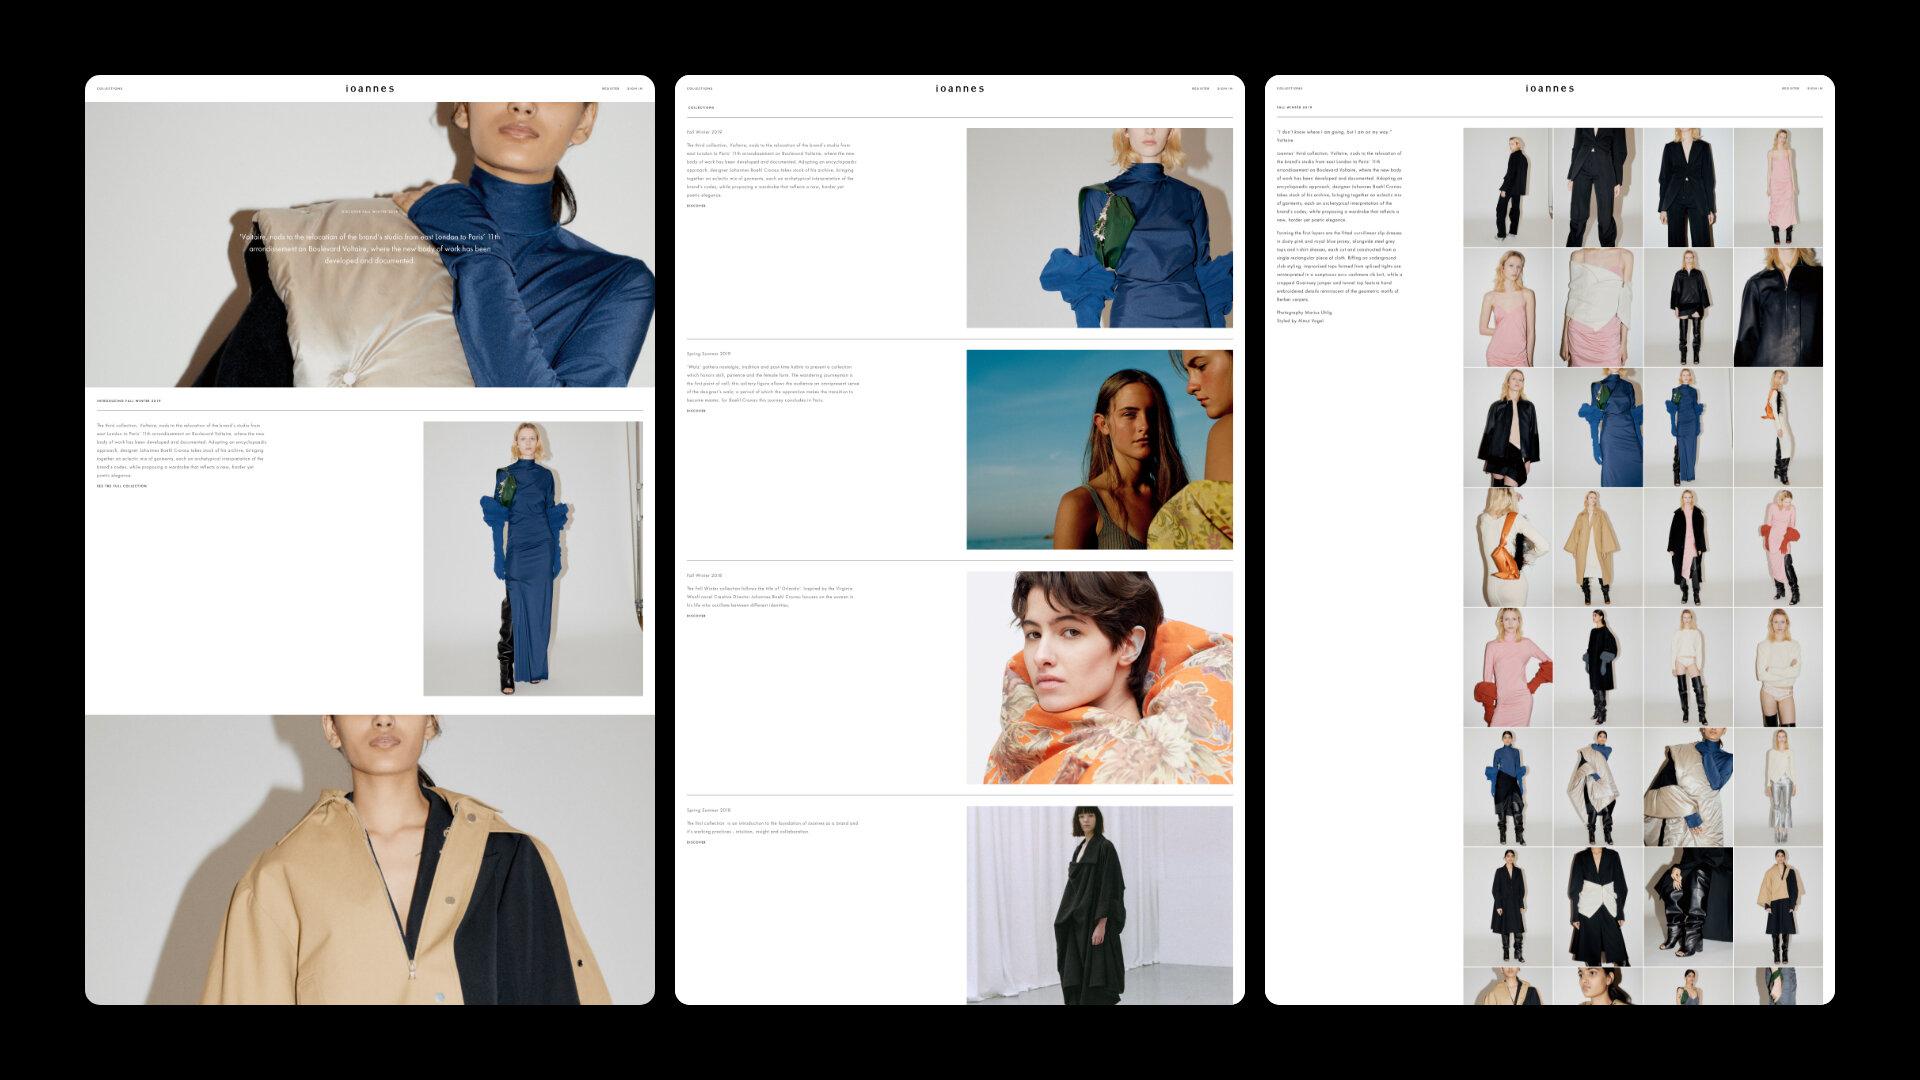 ANCC-E-commerce-Ioannes-02.jpg